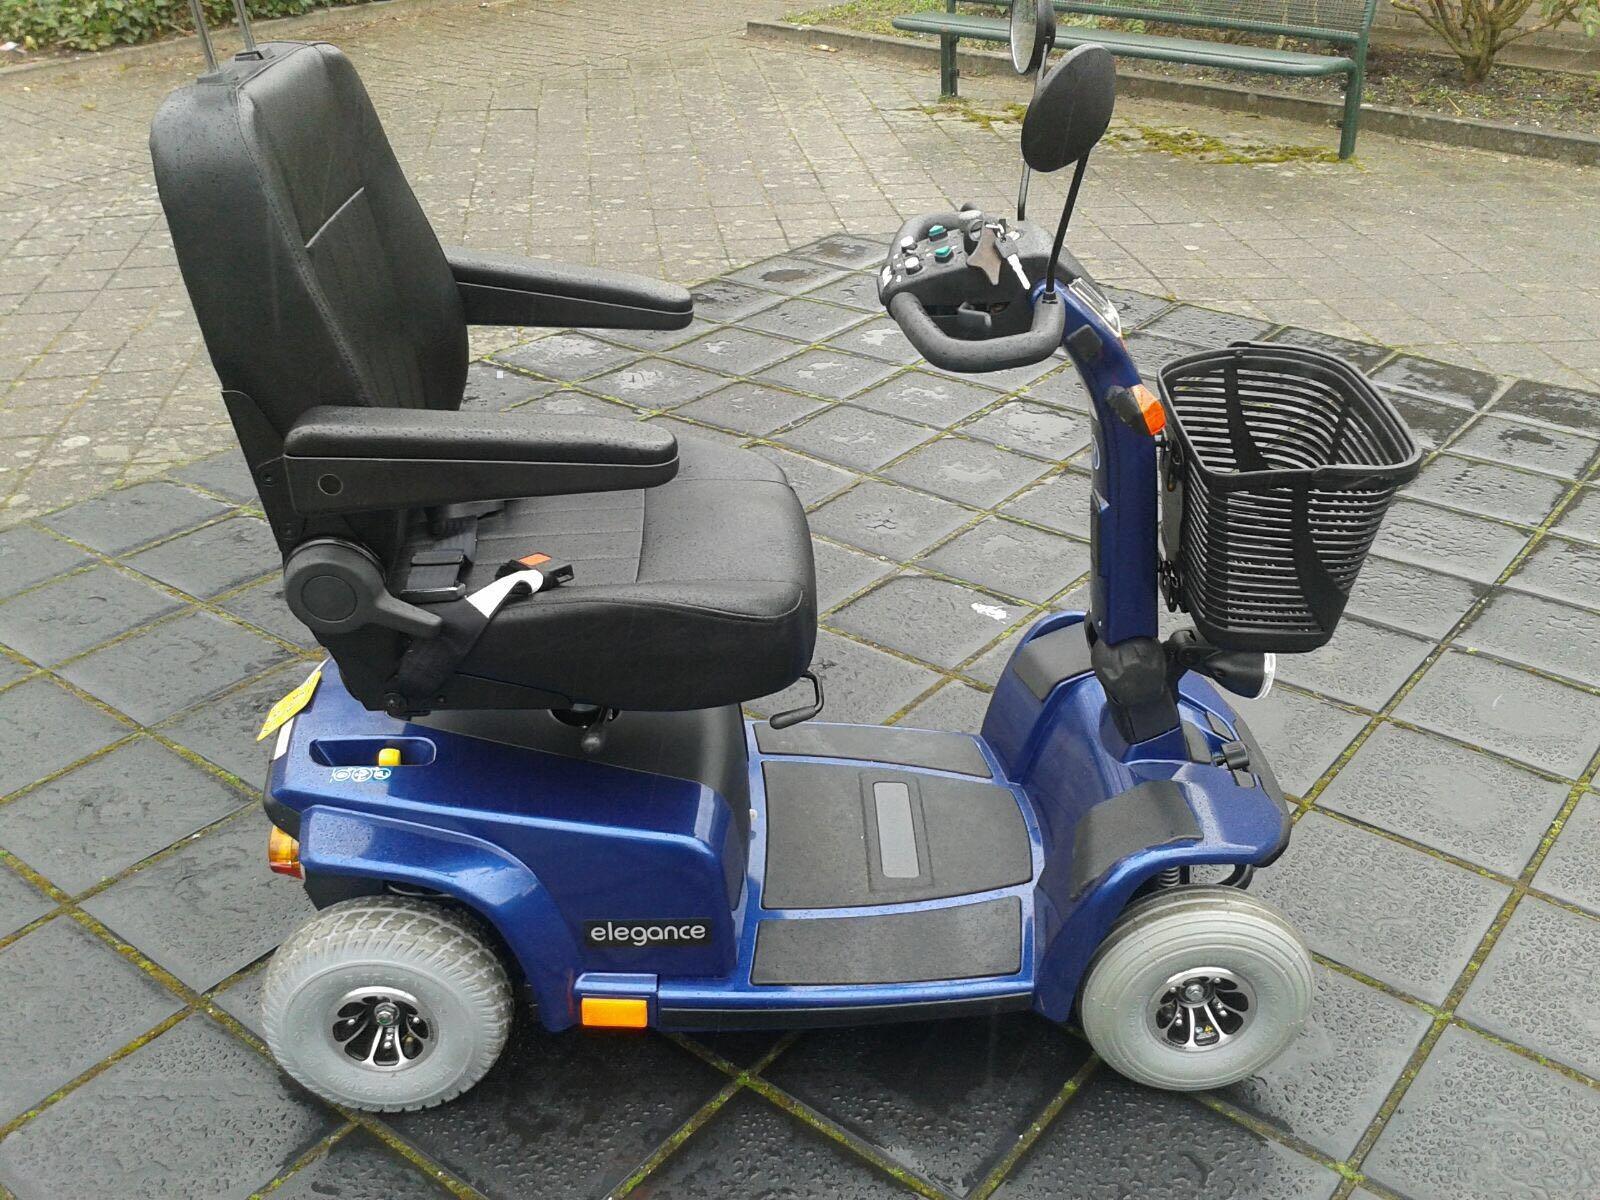 Pride Mobility Elegance